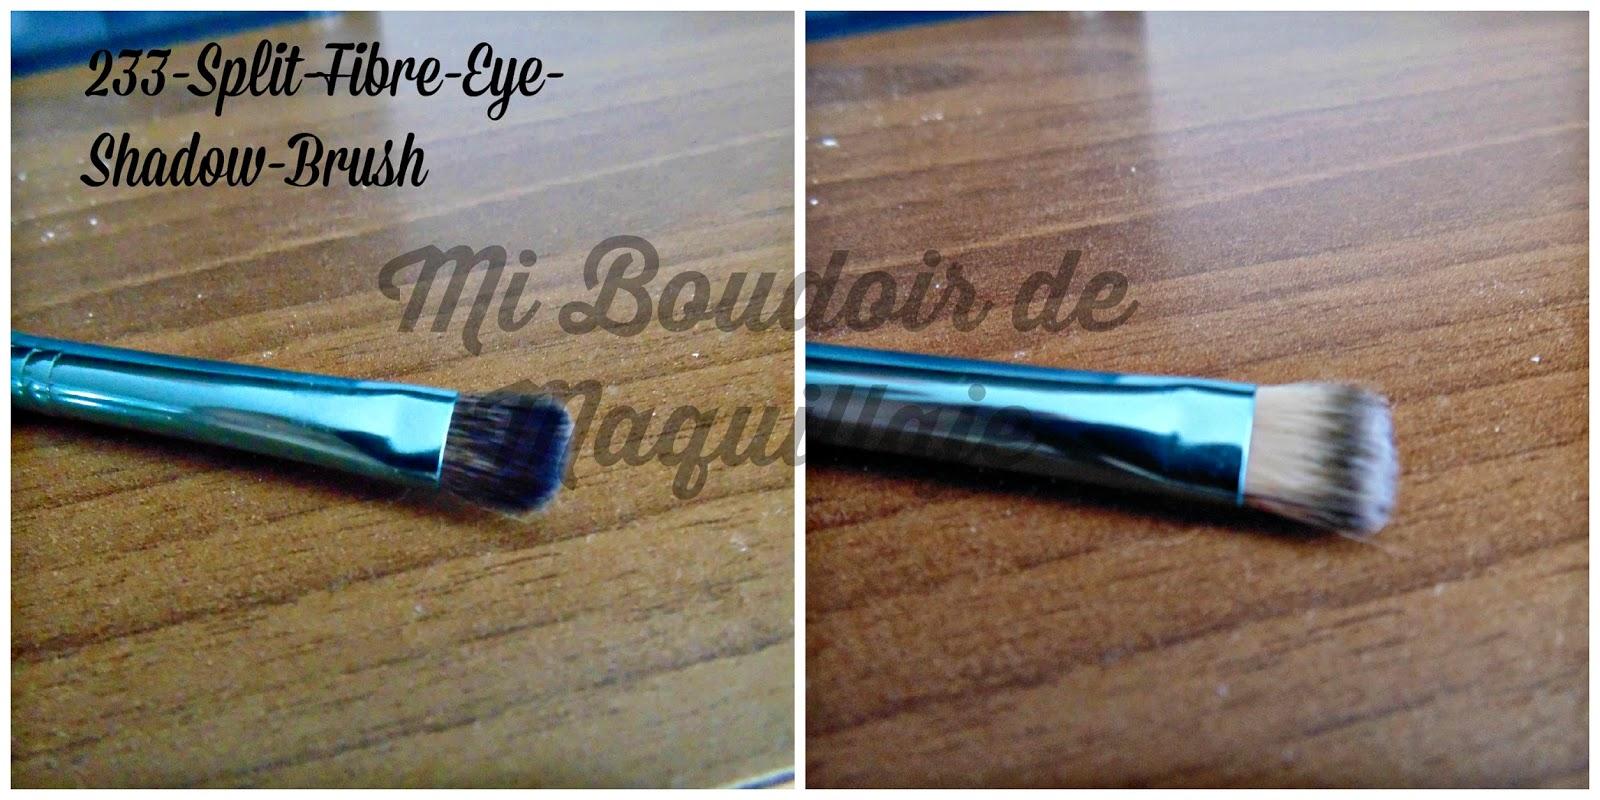 233-Split-Fibre-Eye-Shadow-Brush